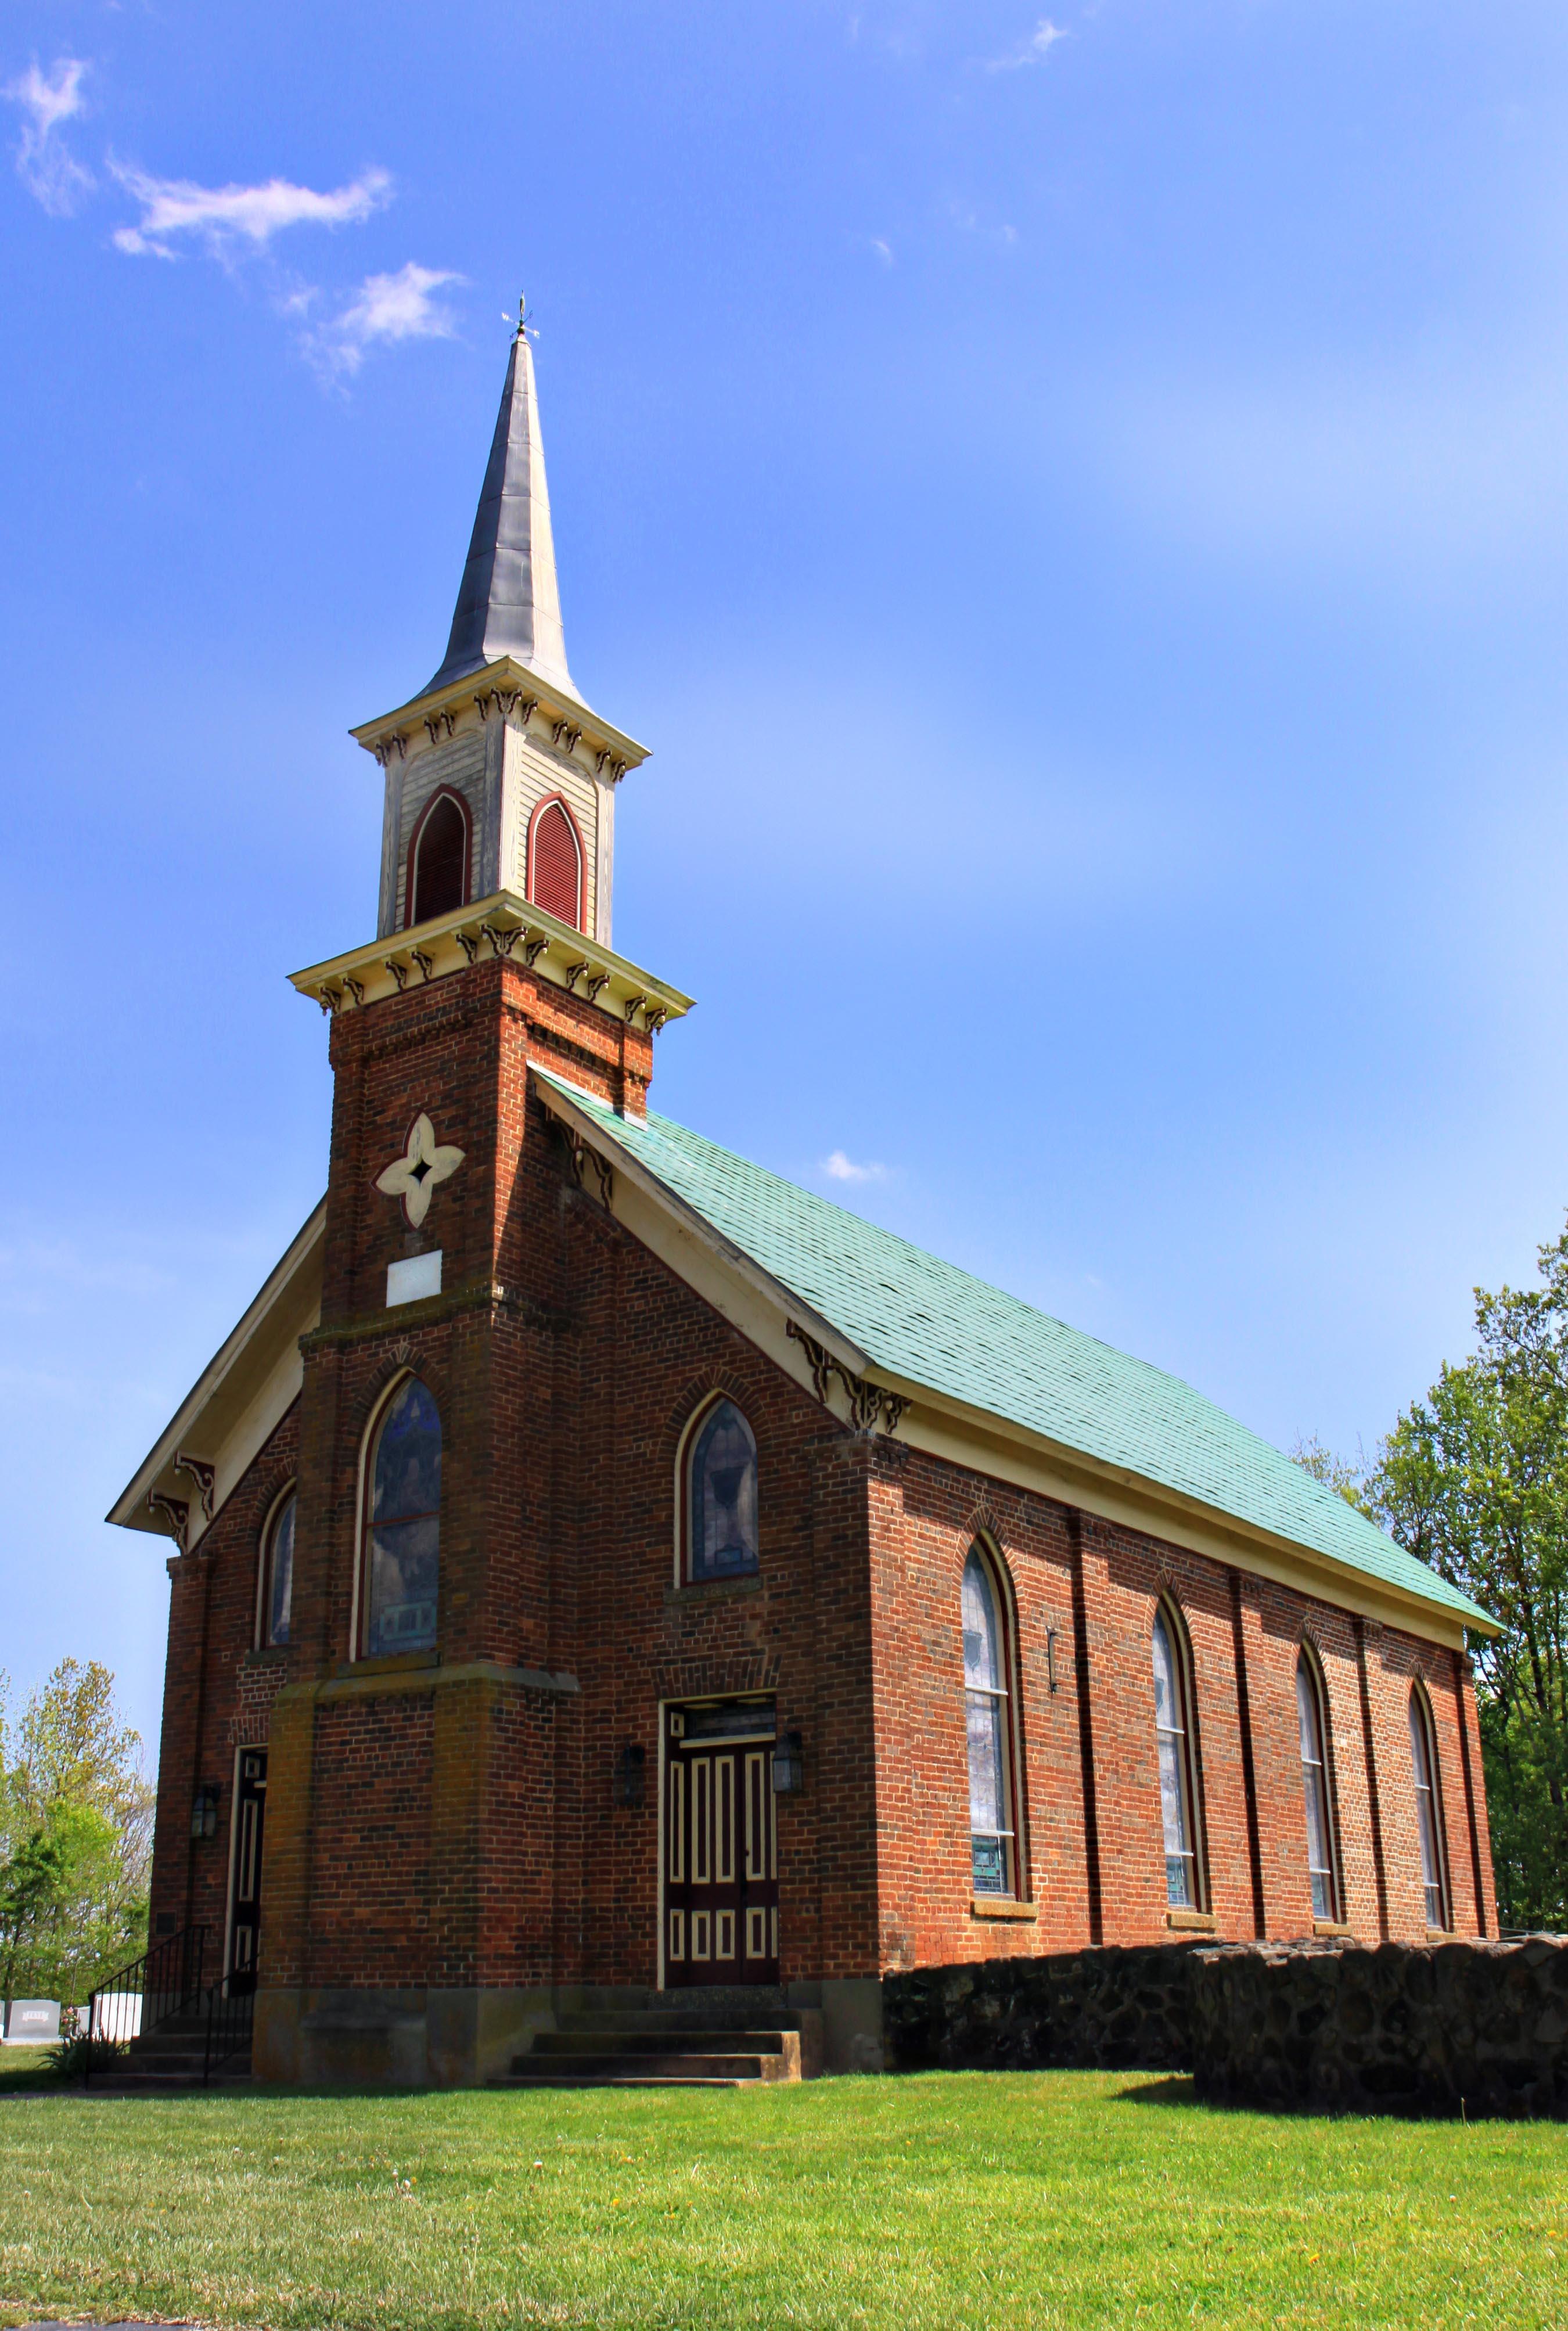 Fulton Methodist Church Credit: Davie County Chamber of Commerce